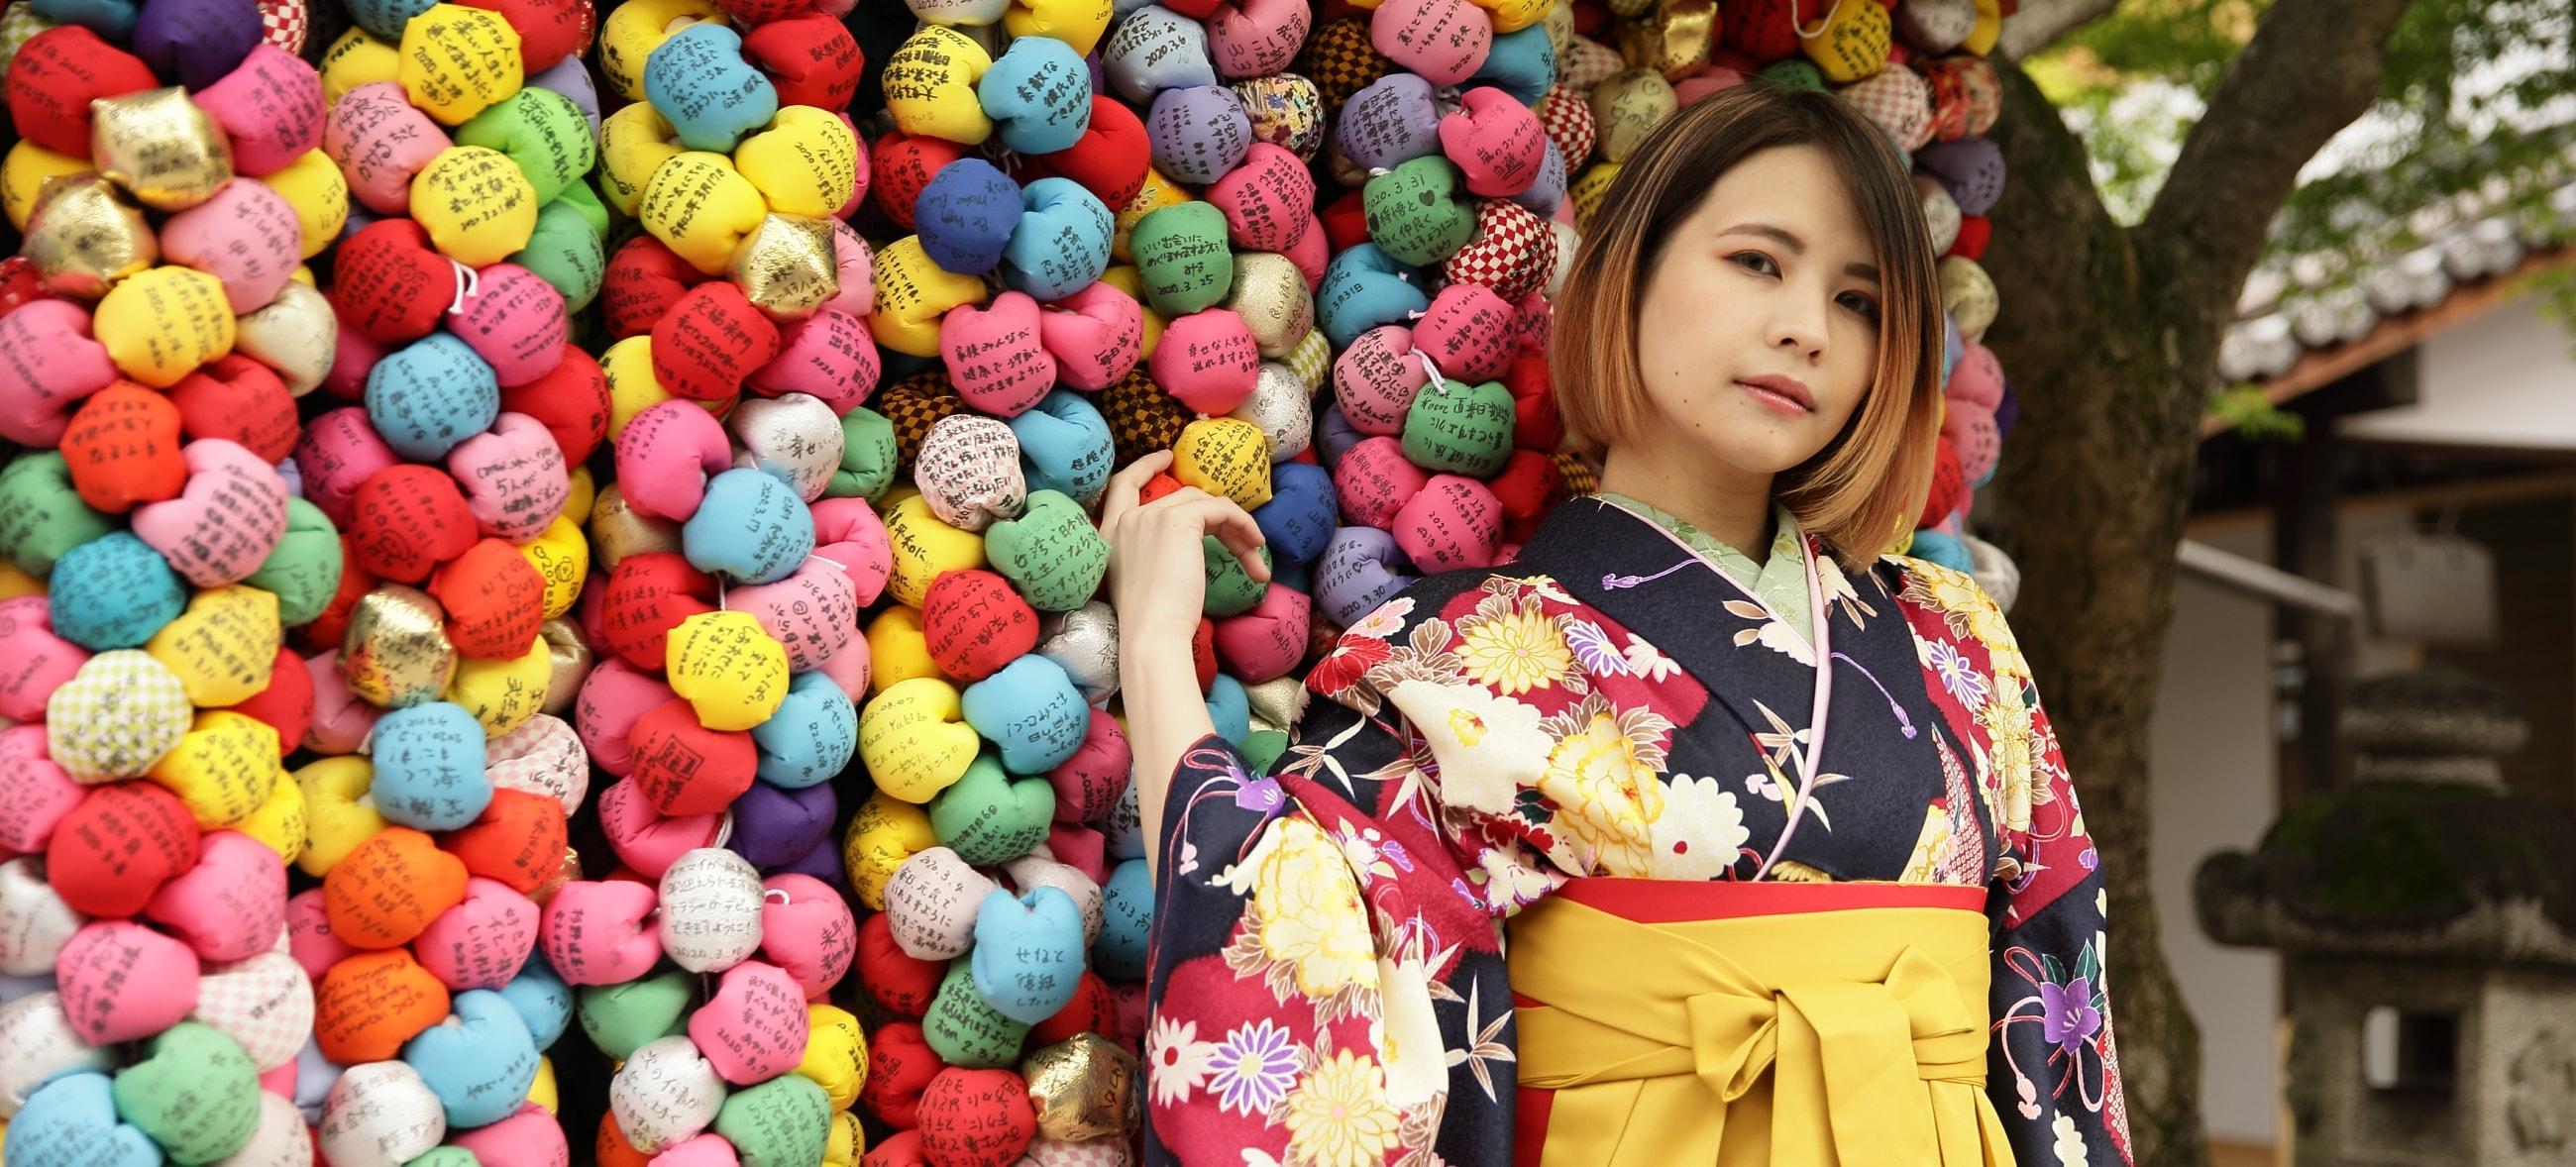 成人記念・七五三・卒業式に振袖・着物・袴で撮影